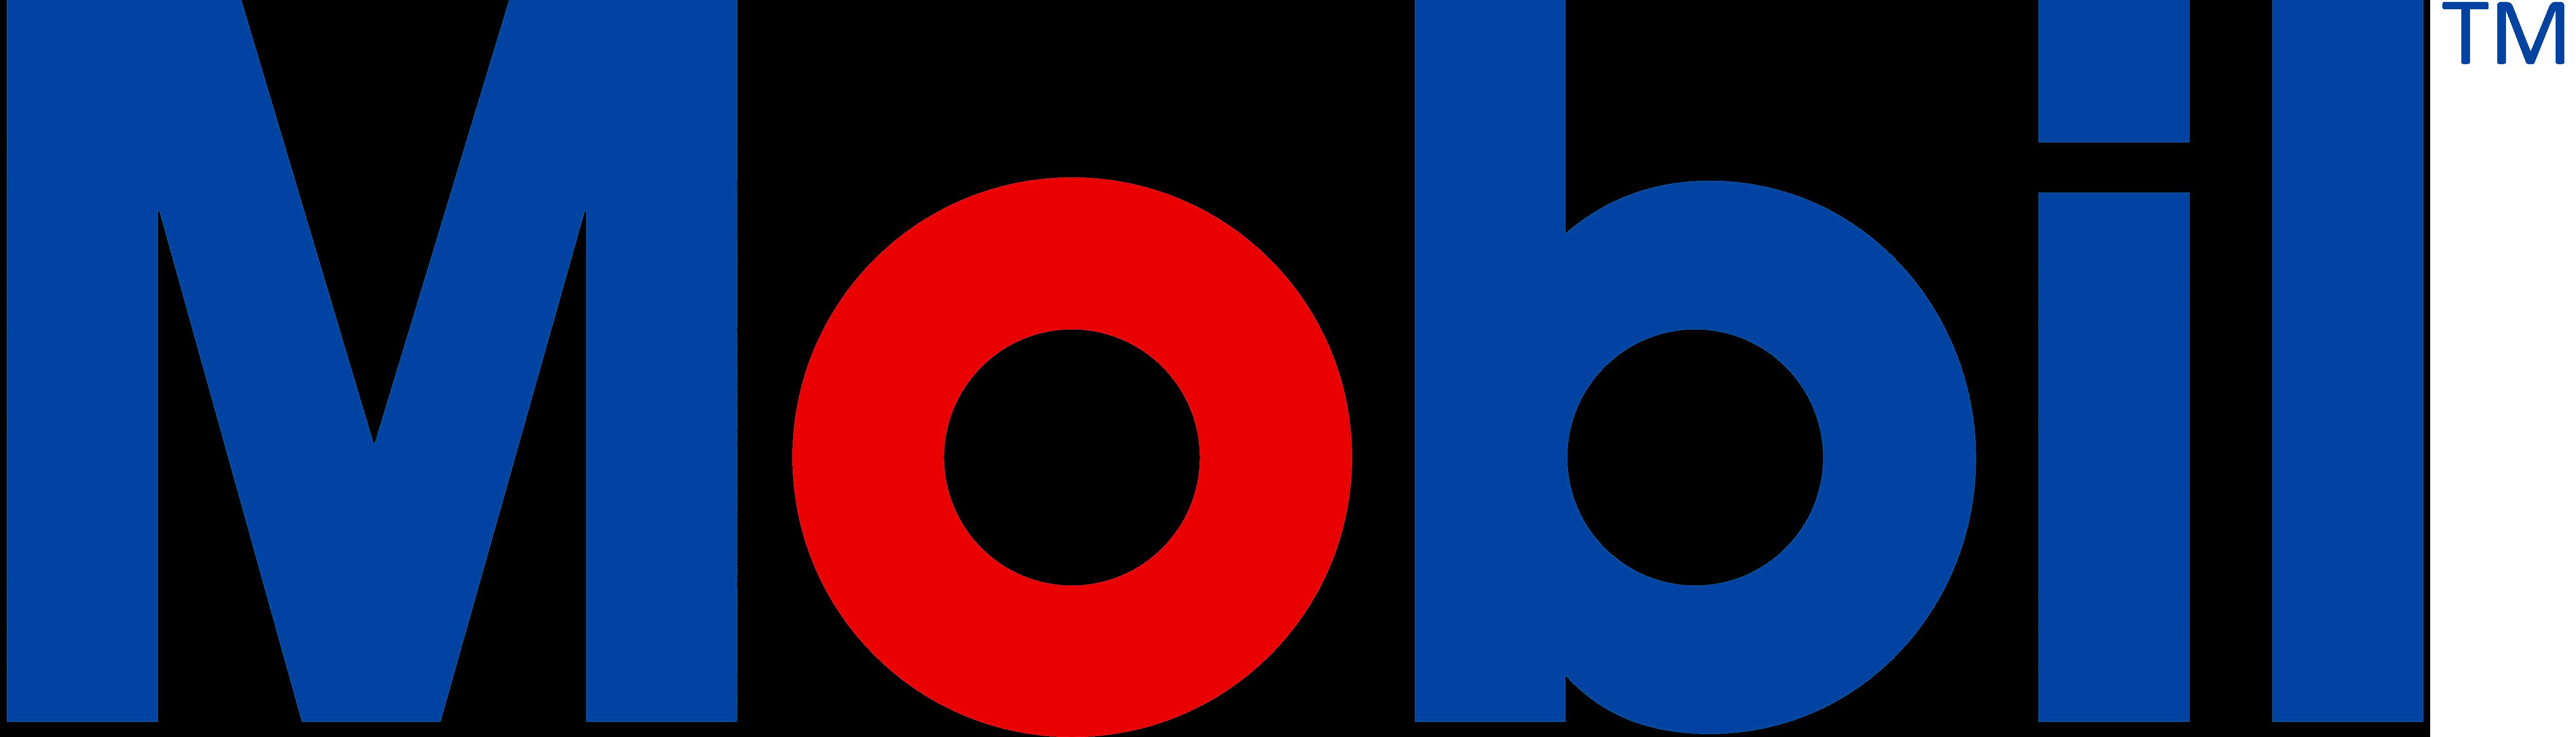 Mobil Oil logo png image